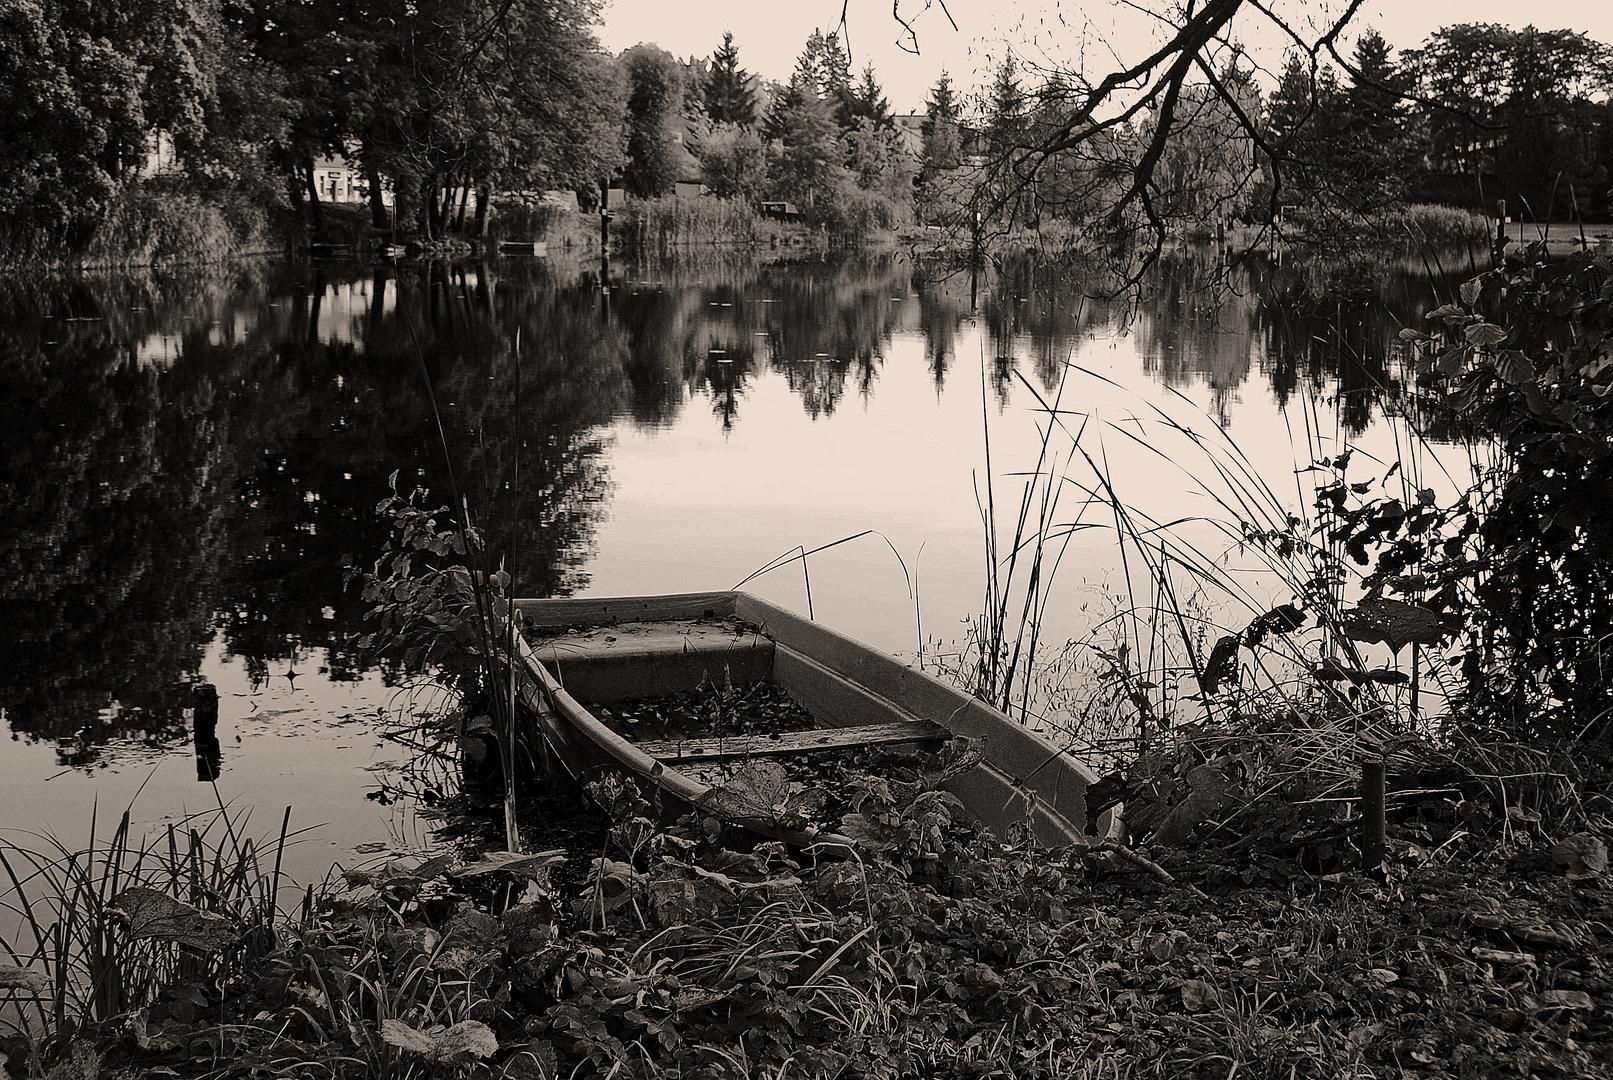 Am alten Kaiser Wilhelm Kanal. Groß Lindow